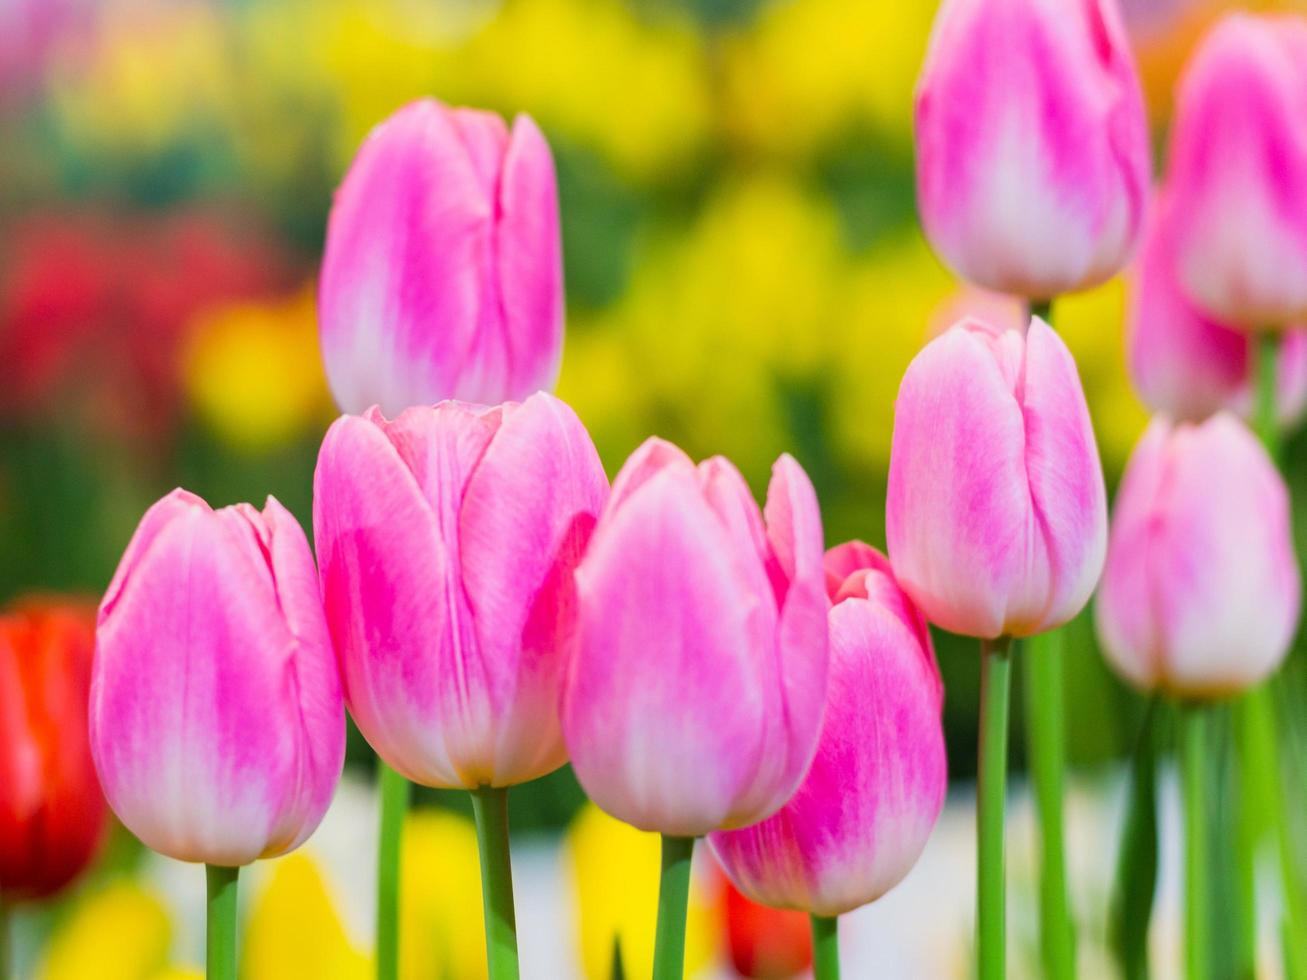 tulipes roses en fleur photo